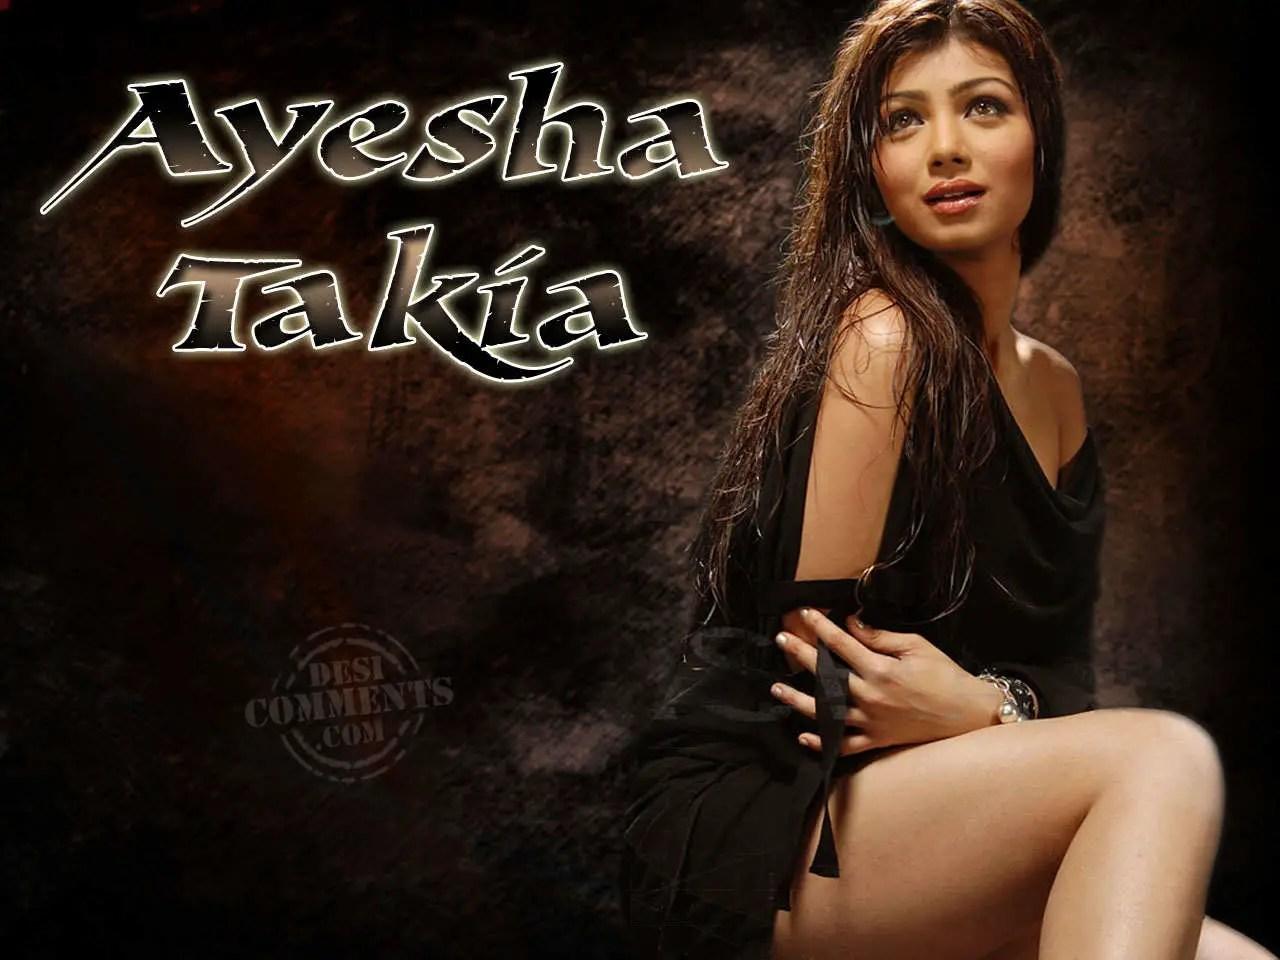 Punjabi Girl With Gun Hd Wallpaper Hot Pose Ayesha Takia Desicomments Com